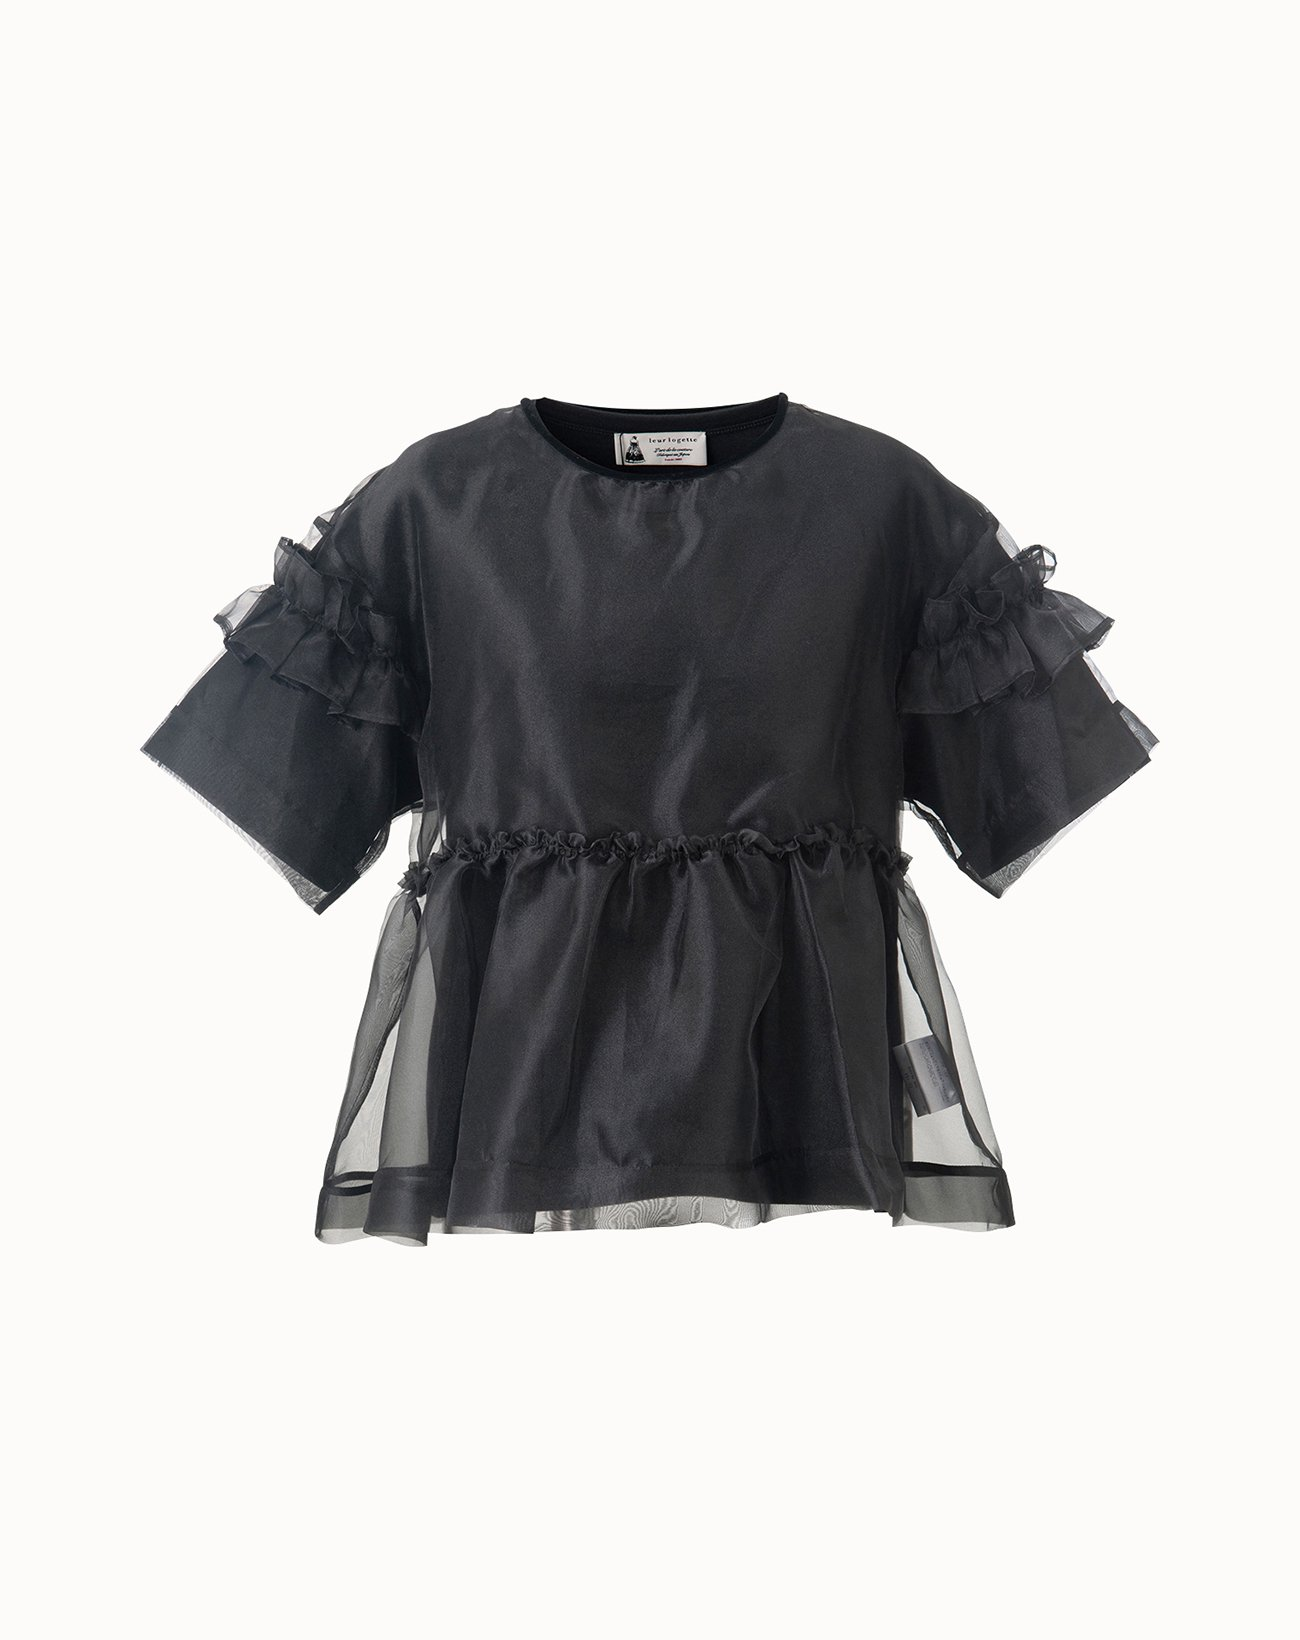 Organdy Layered Top - Black